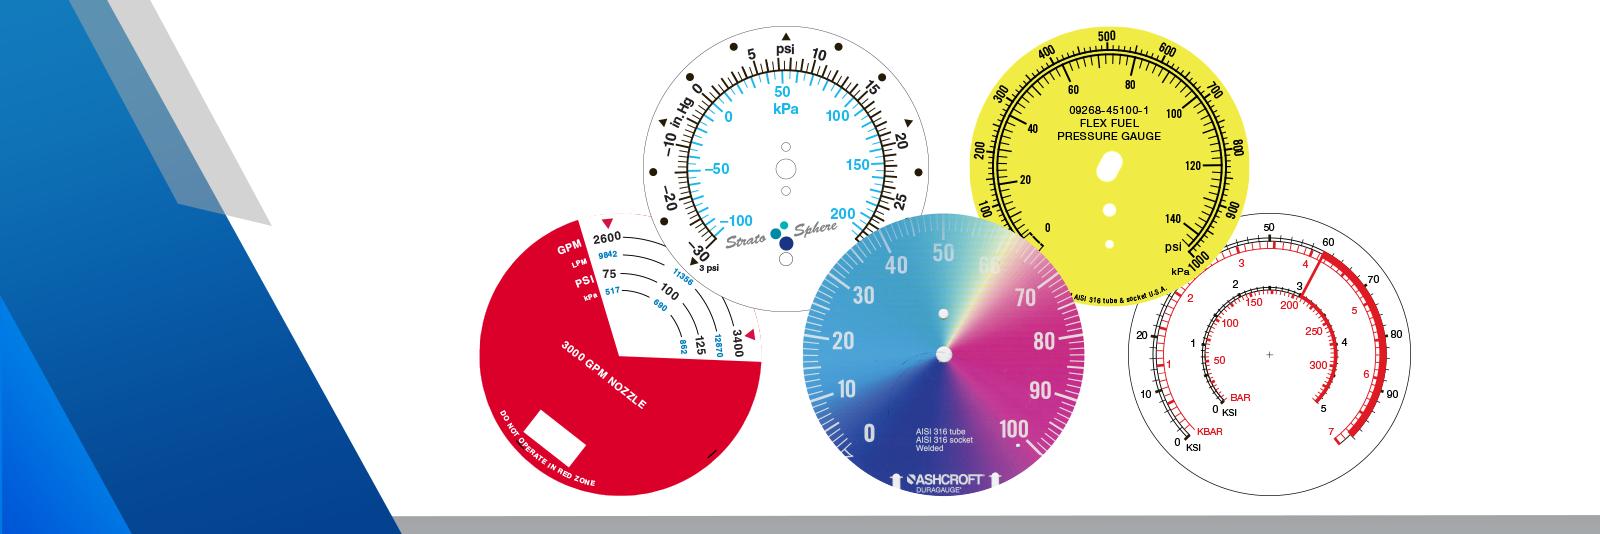 How Can I Order Custom Dials for Pressure Gauges?